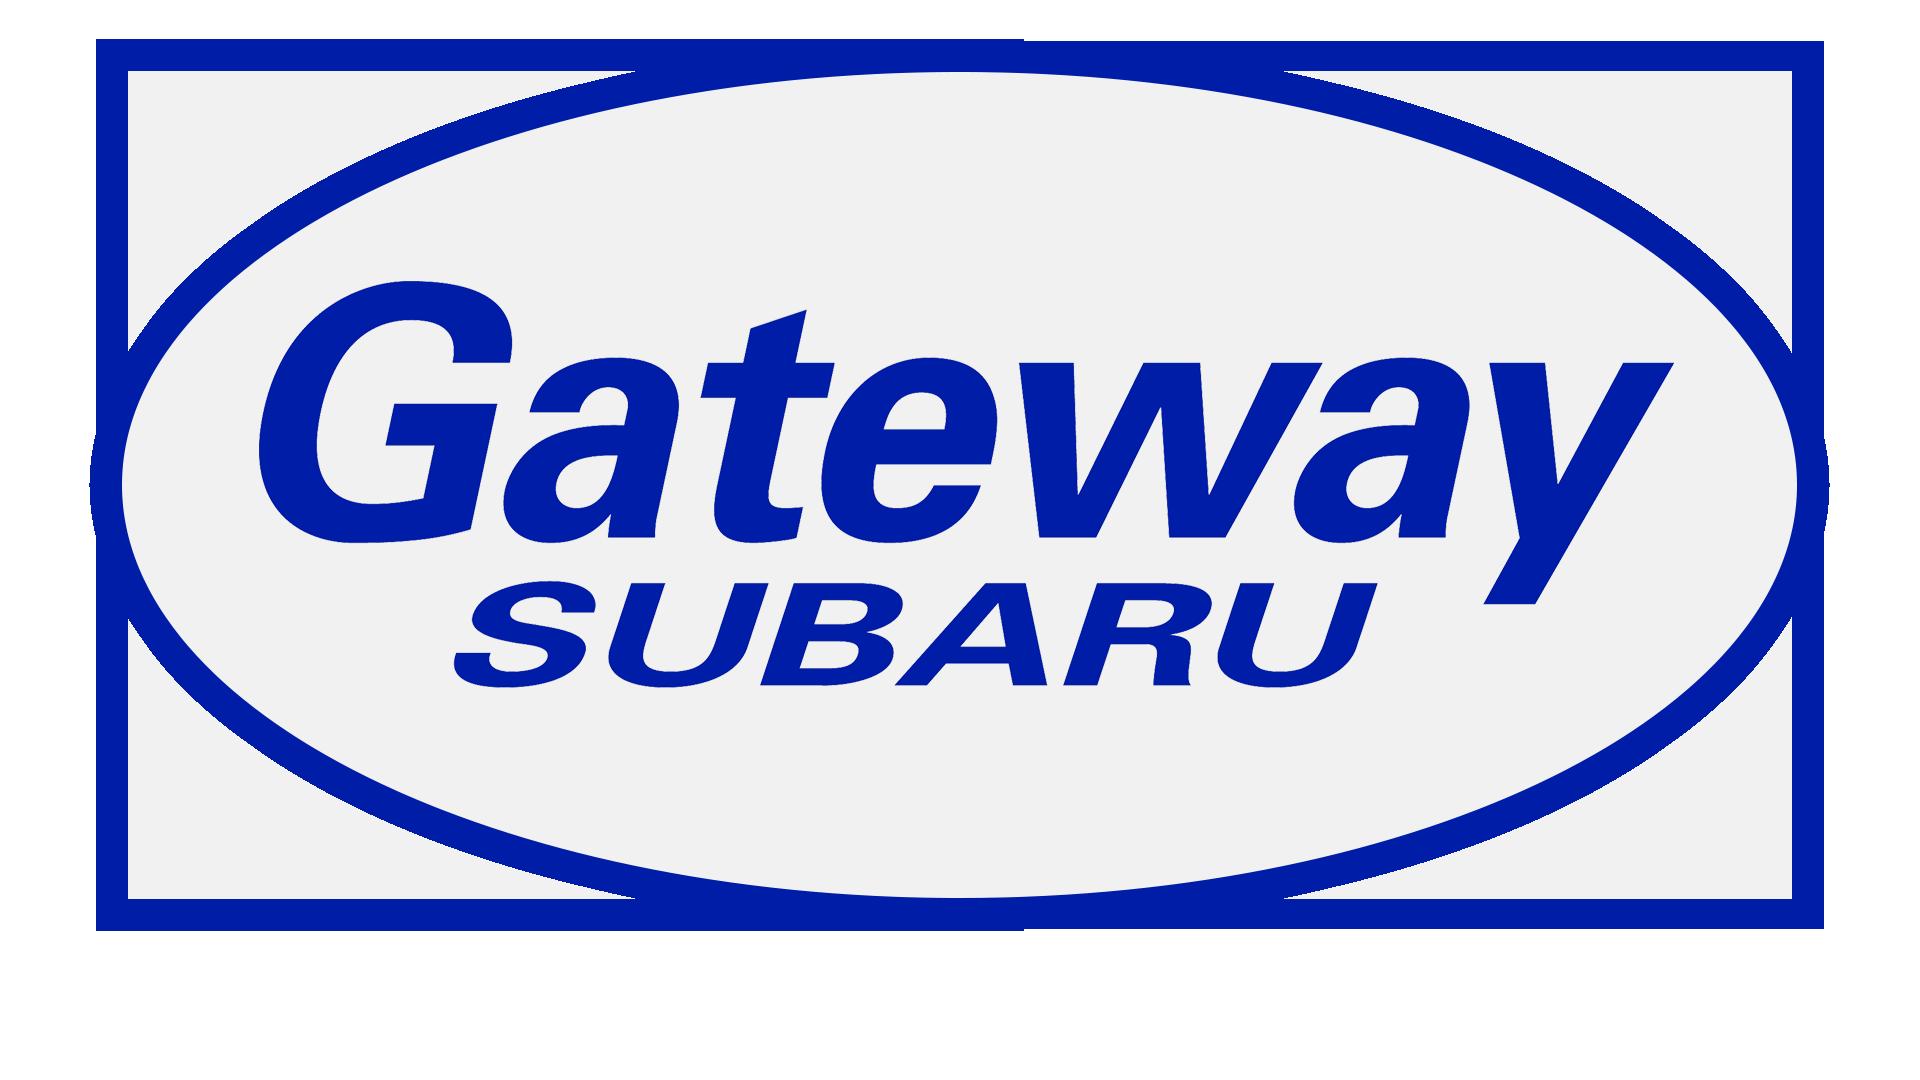 https://growthzonesitesprod.azureedge.net/wp-content/uploads/sites/1215/2021/02/Gateway-Oval-Logo.png